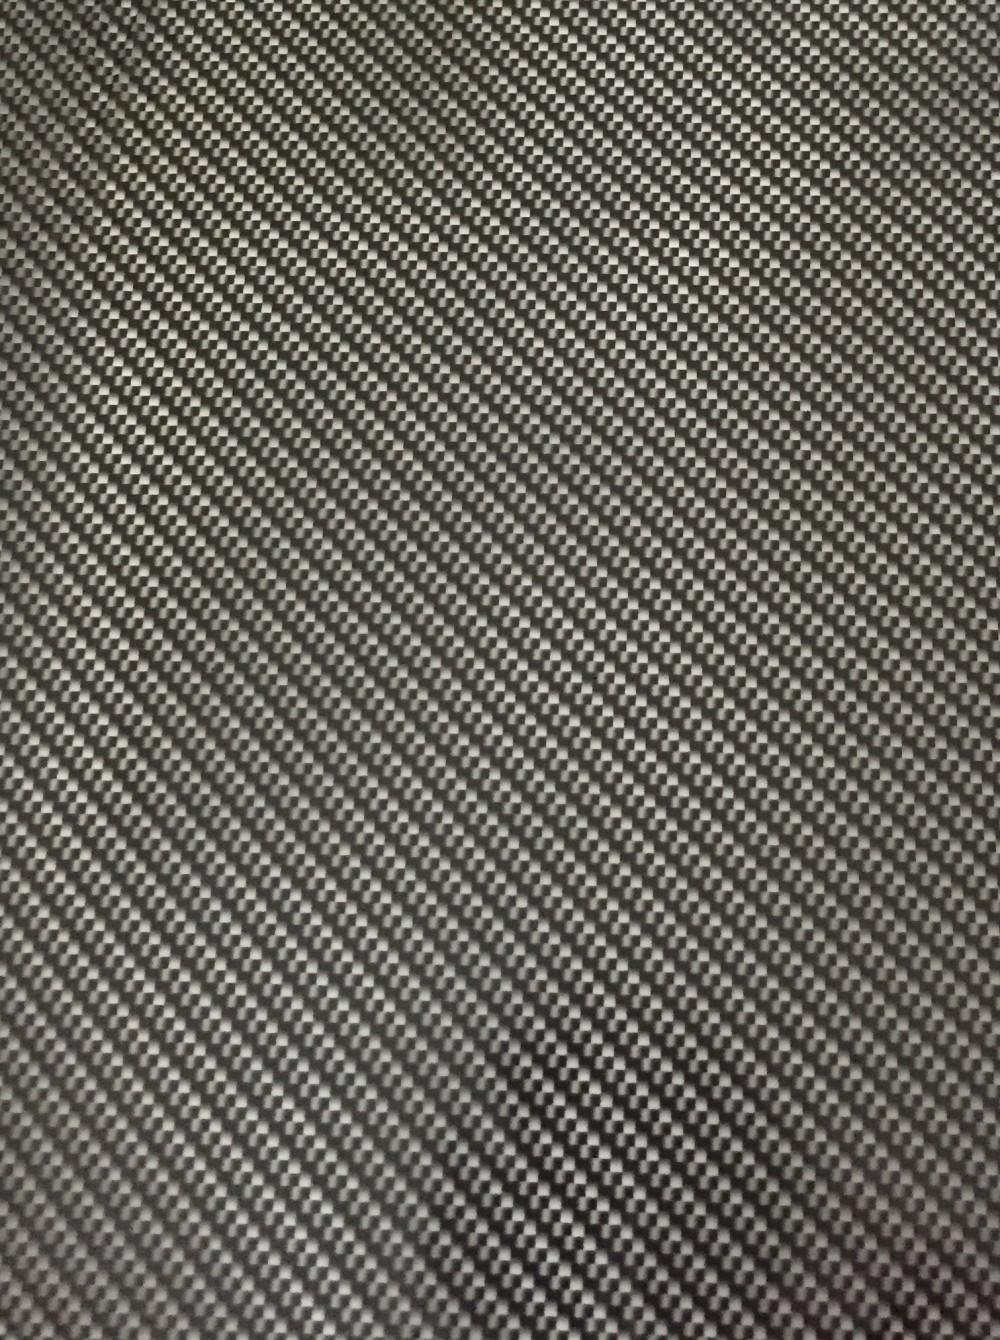 Carbon Black Metallic: Black Carbon Fiber (100cm)